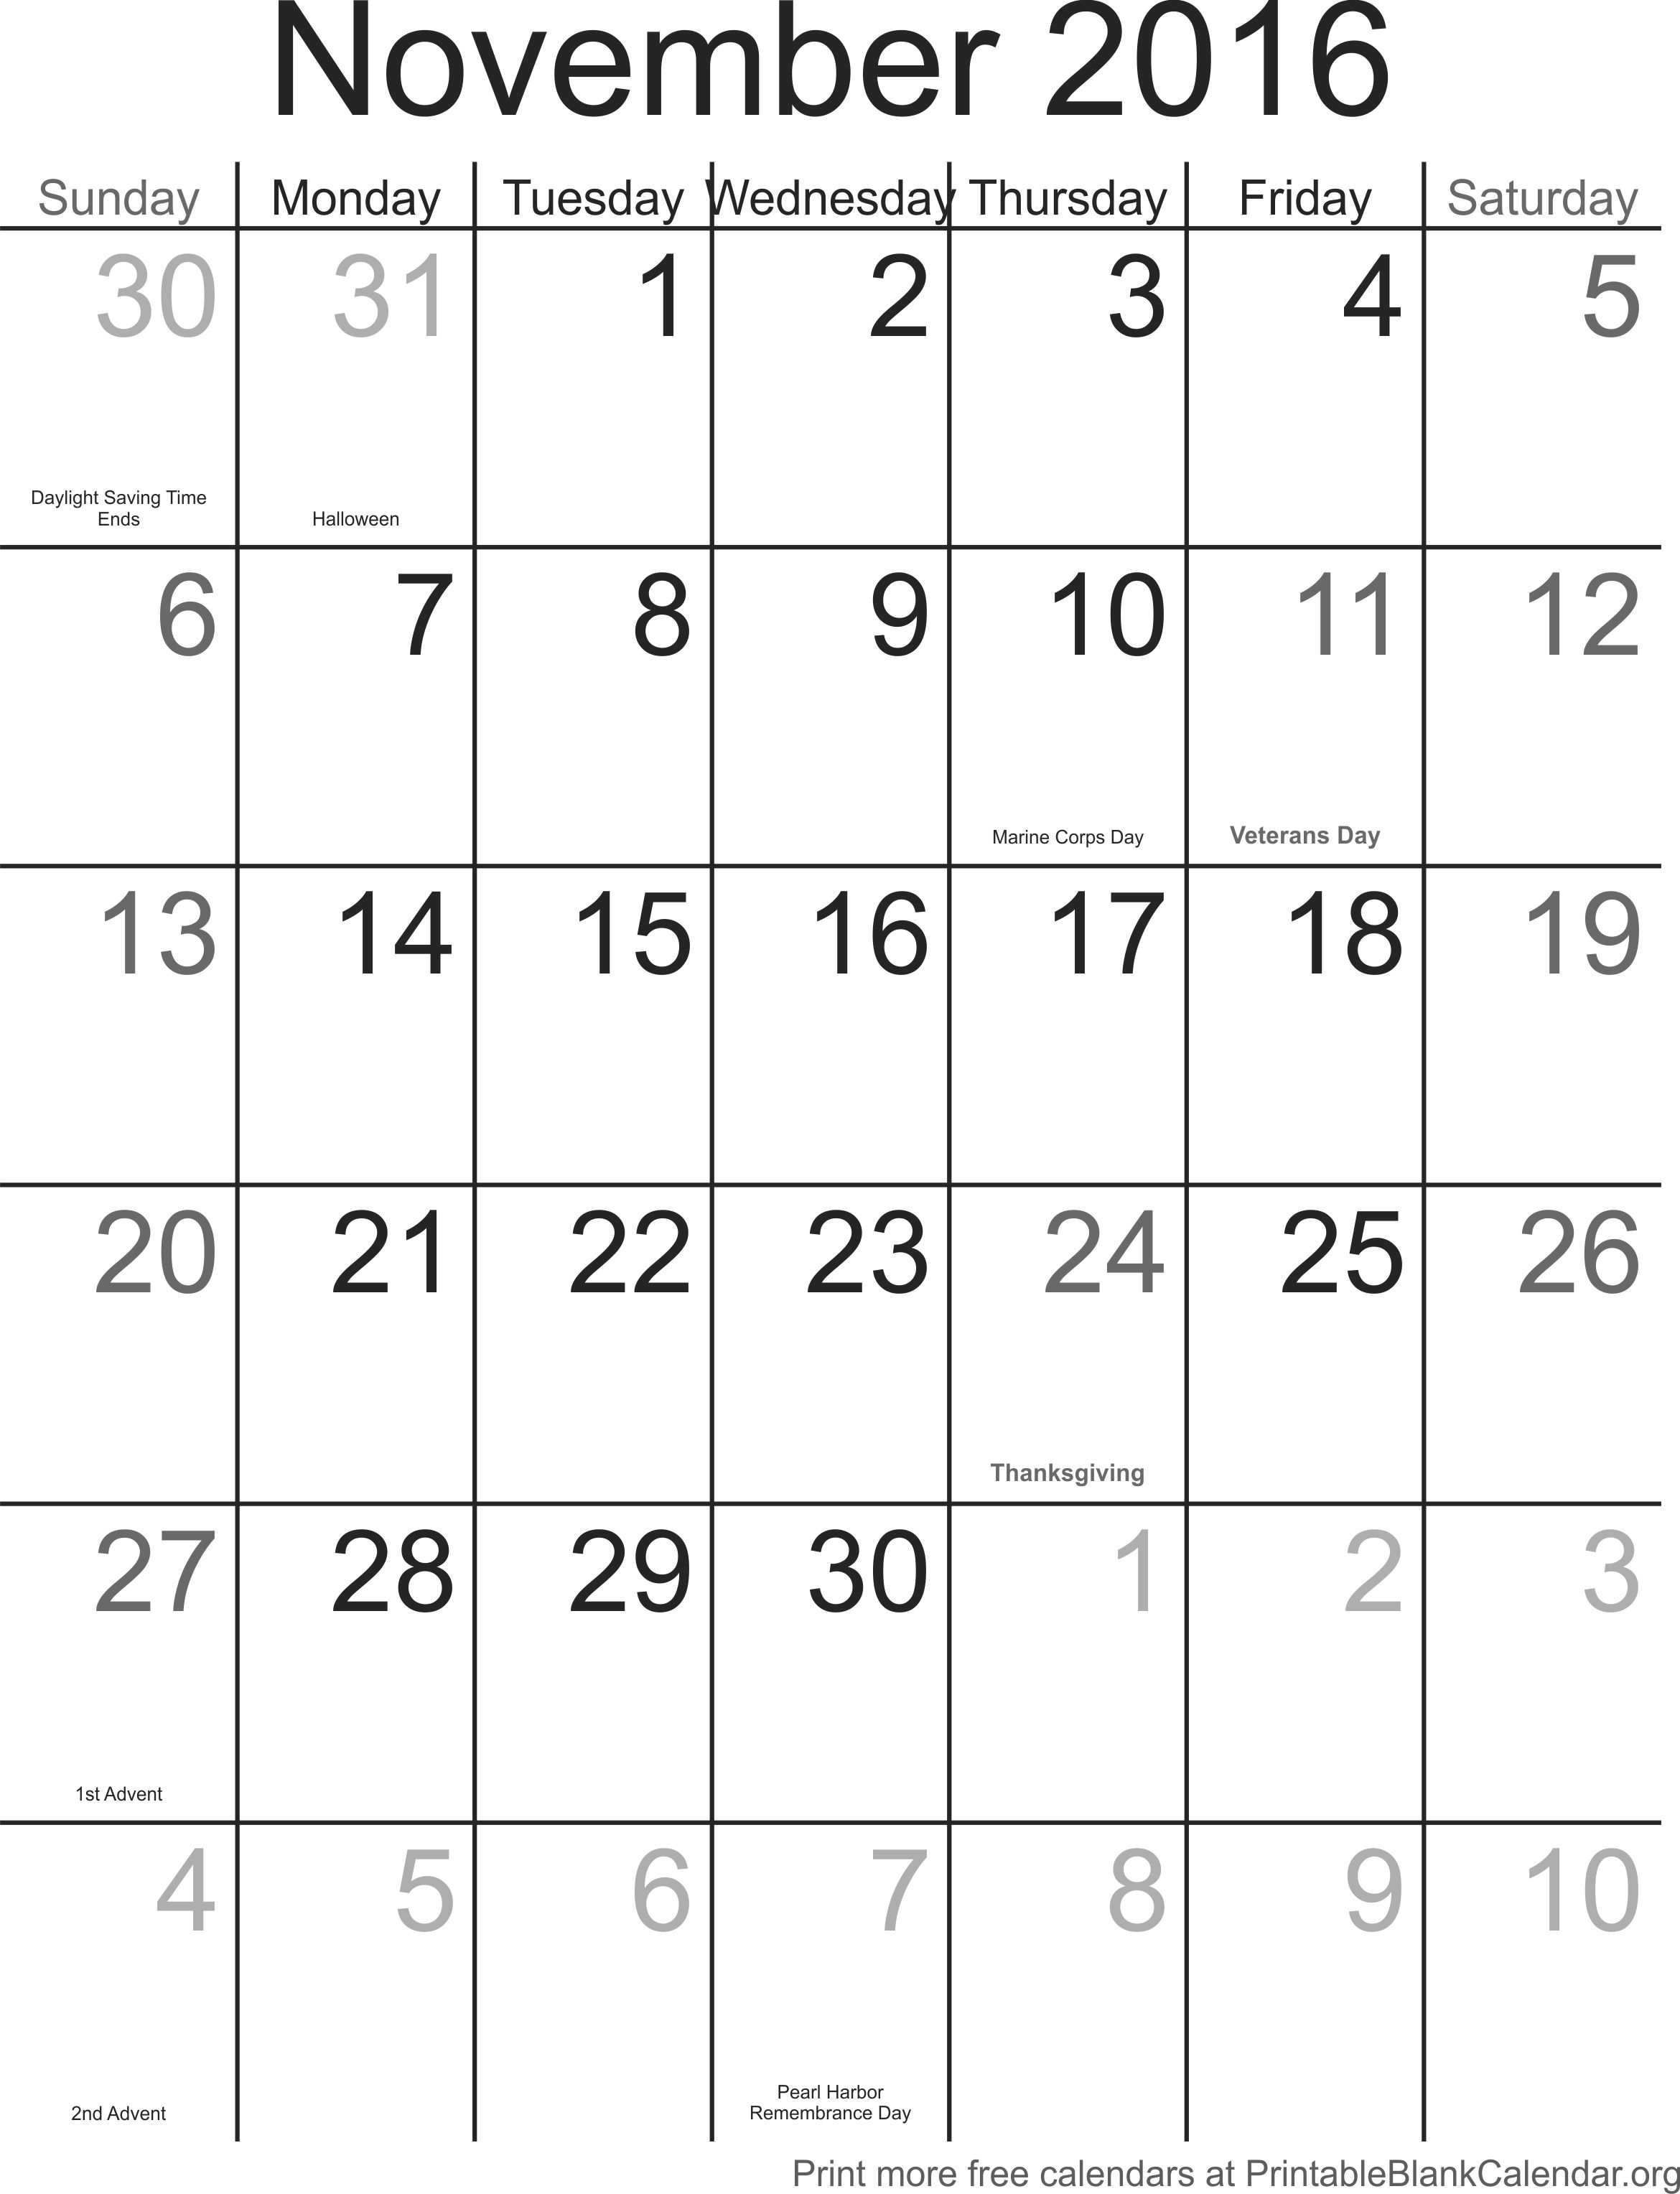 Weekly Calendar November 2016 : November free printable calendar blank